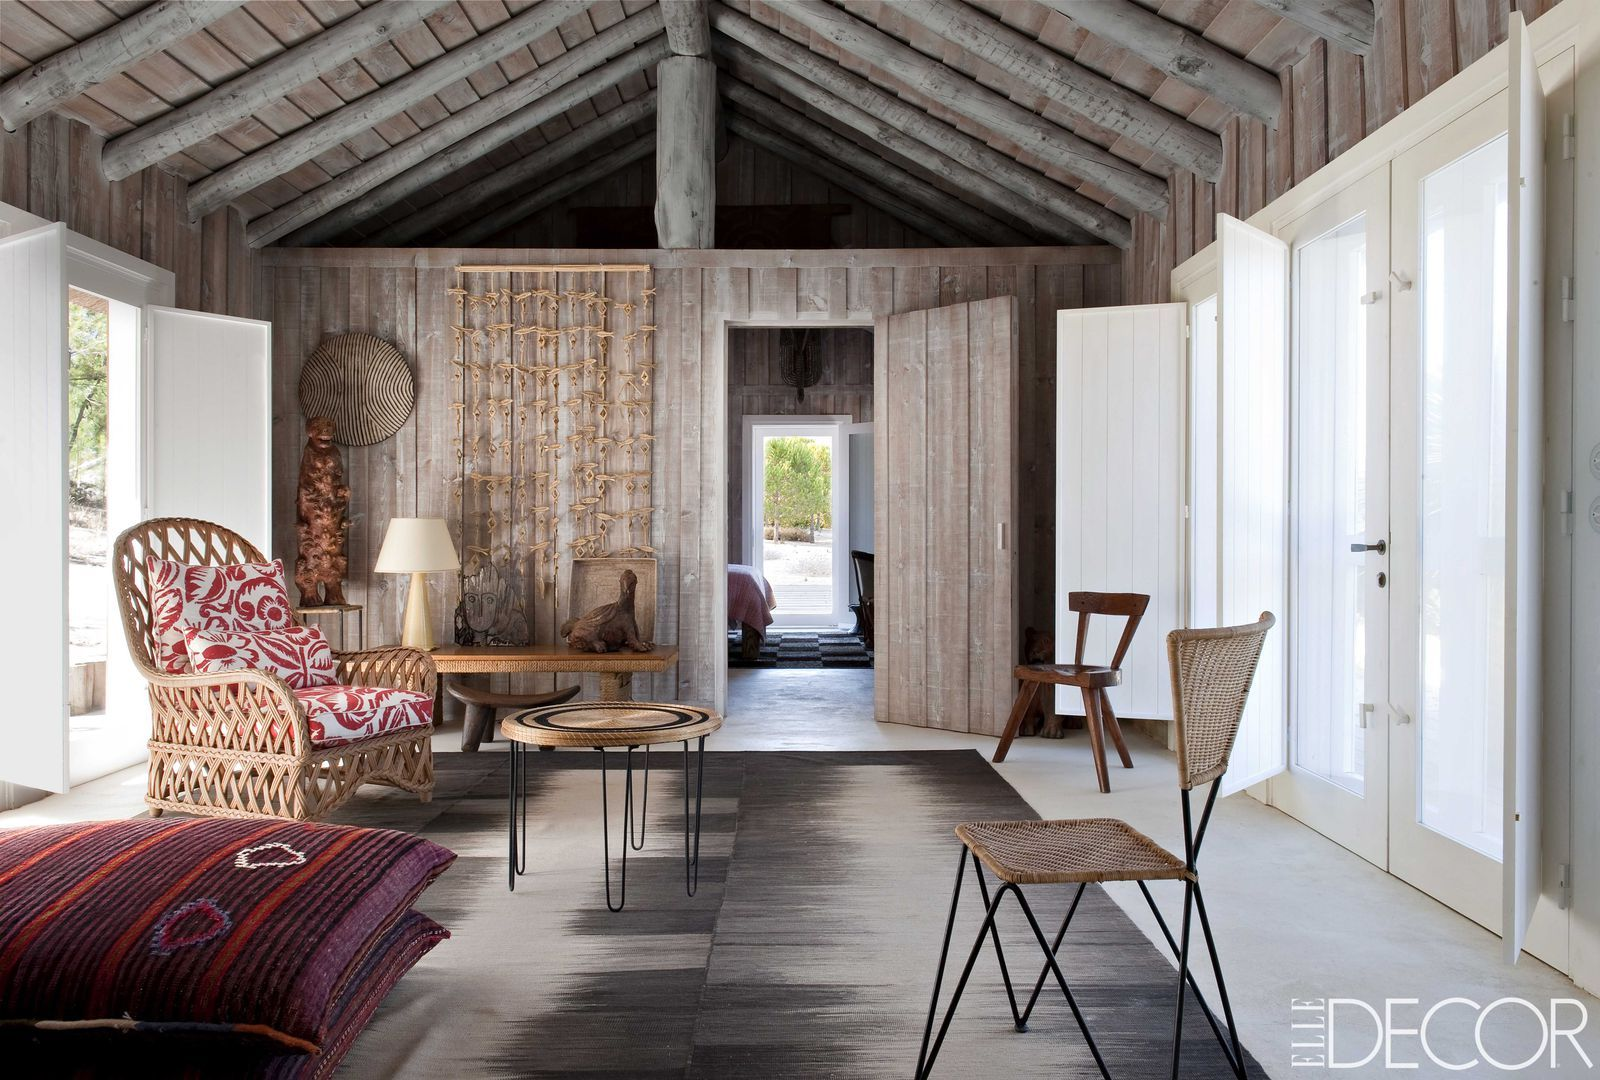 5 casas de verano con un diseño inspirador Decoración de